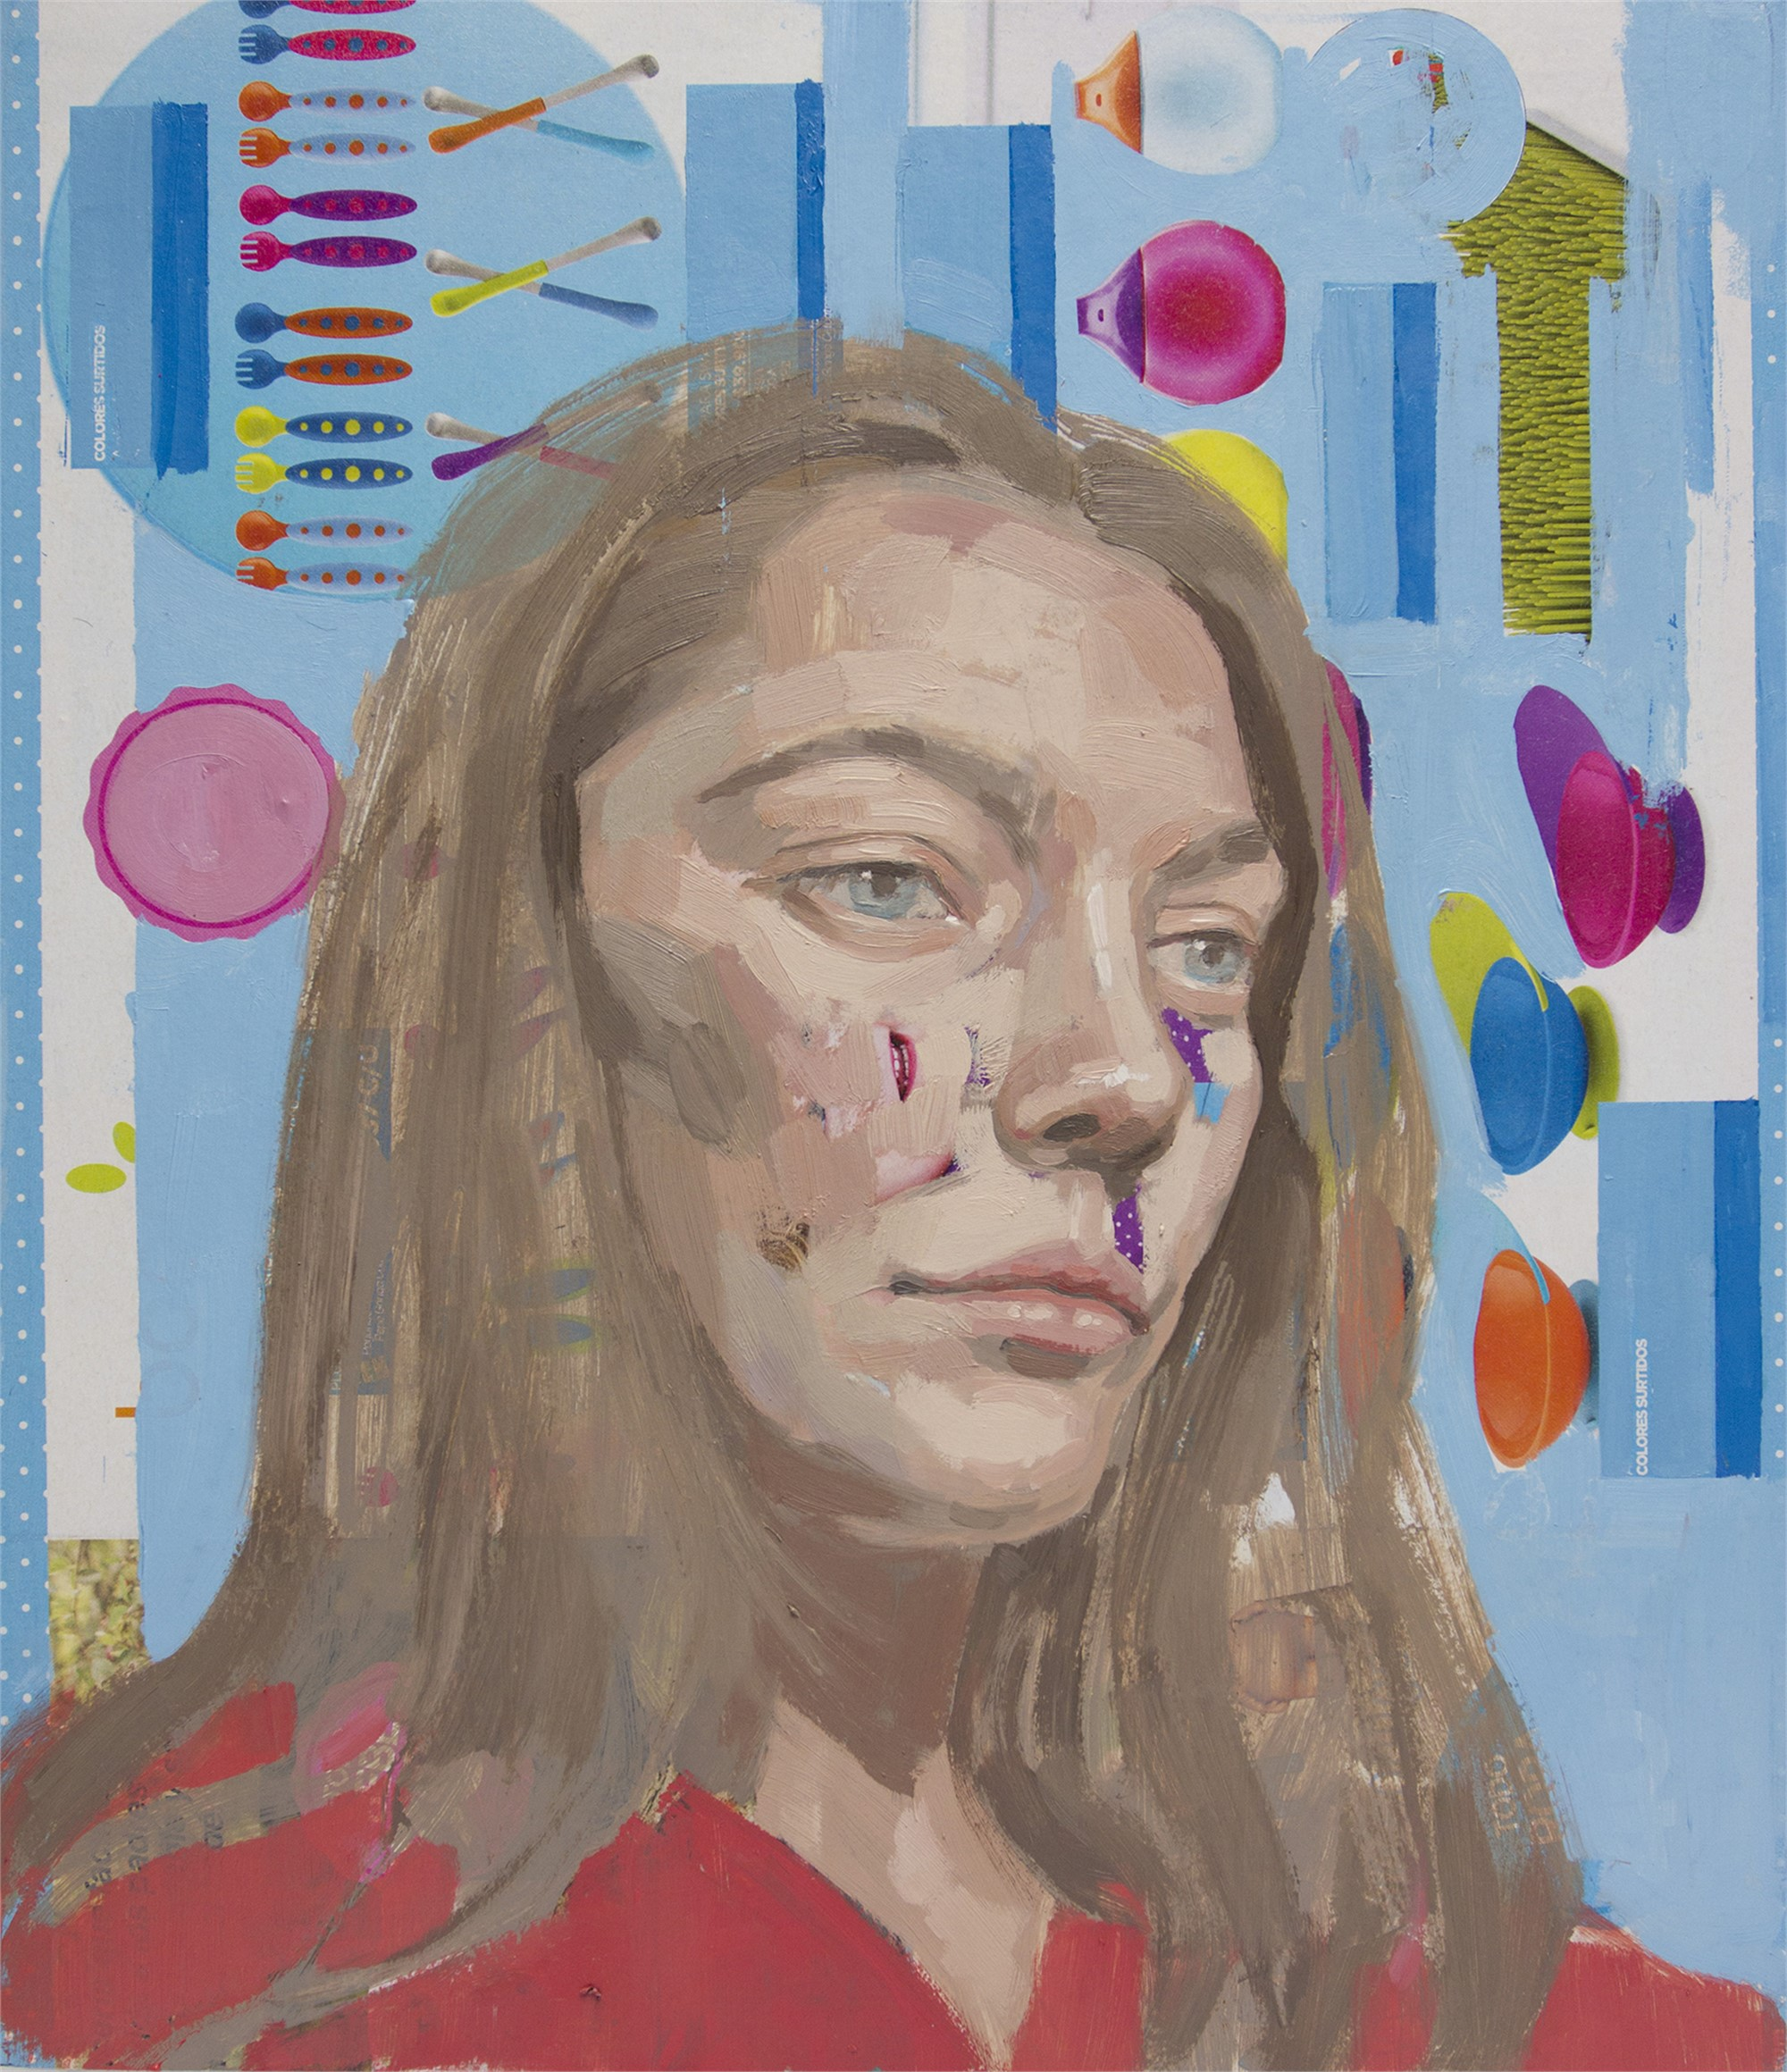 Colores Surtidos by Rossina Bossio